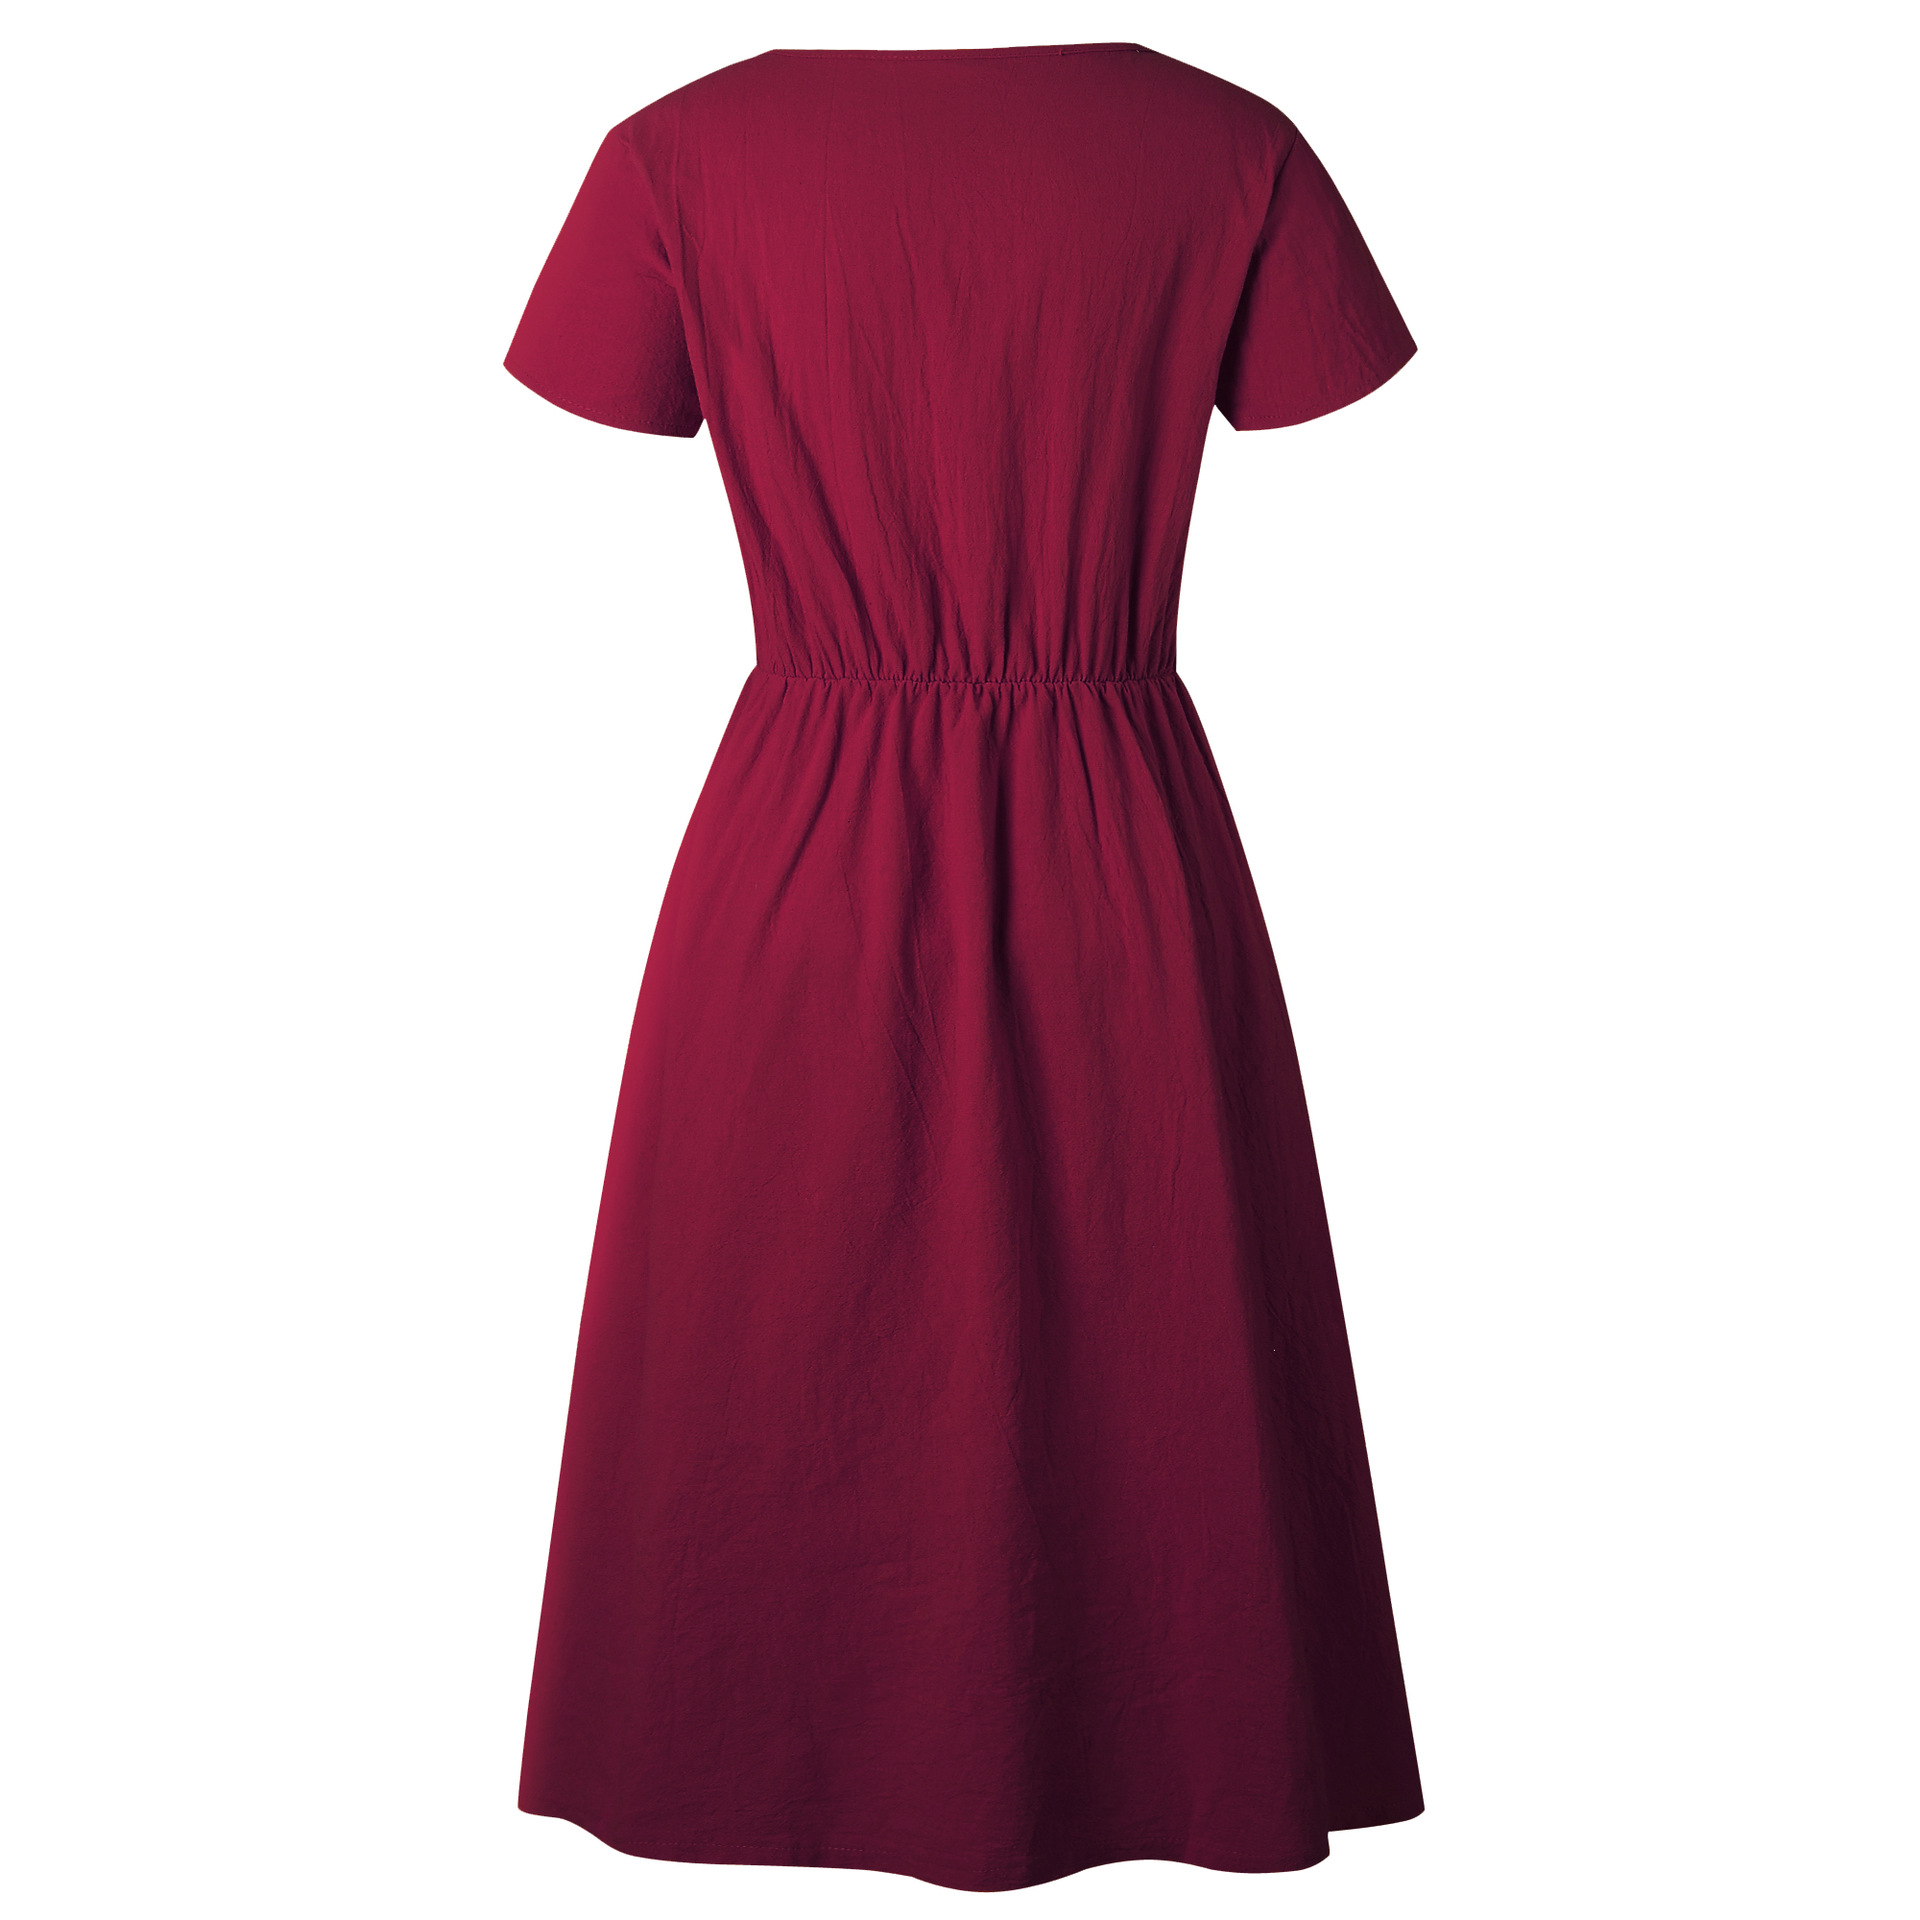 Red Blue A Line Casual Dresses Women Autumn Dress 19 Vintage Long Sleeve Dress For Ladies Buttons V Neck Midi Vestidos Female 92